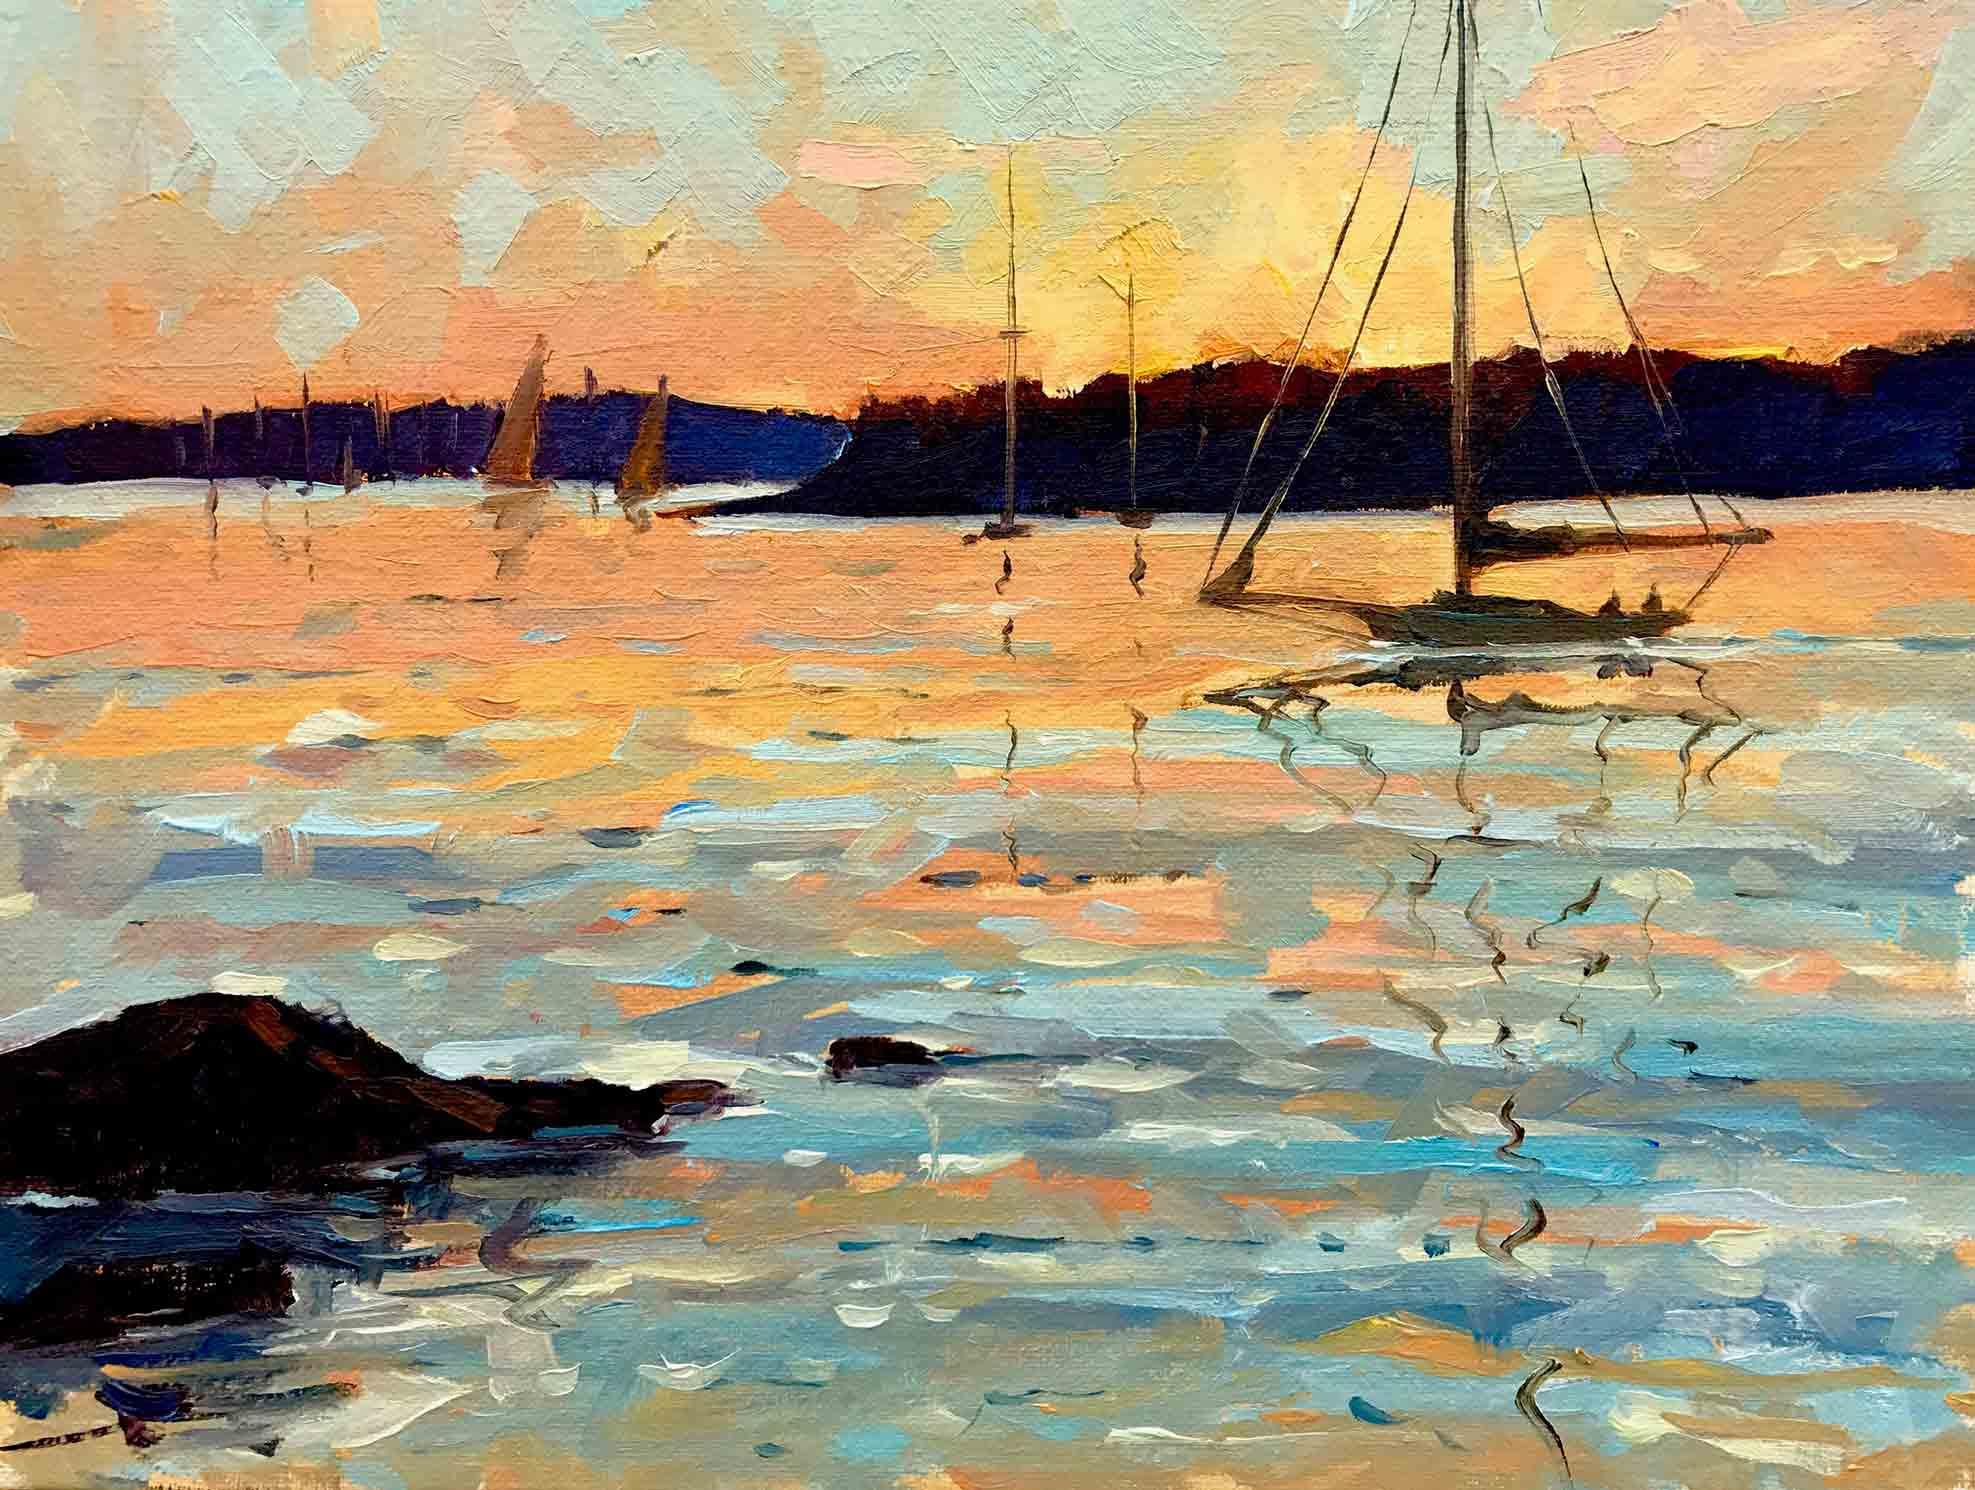 Sunset-over-Spruce-Point_web.jpg